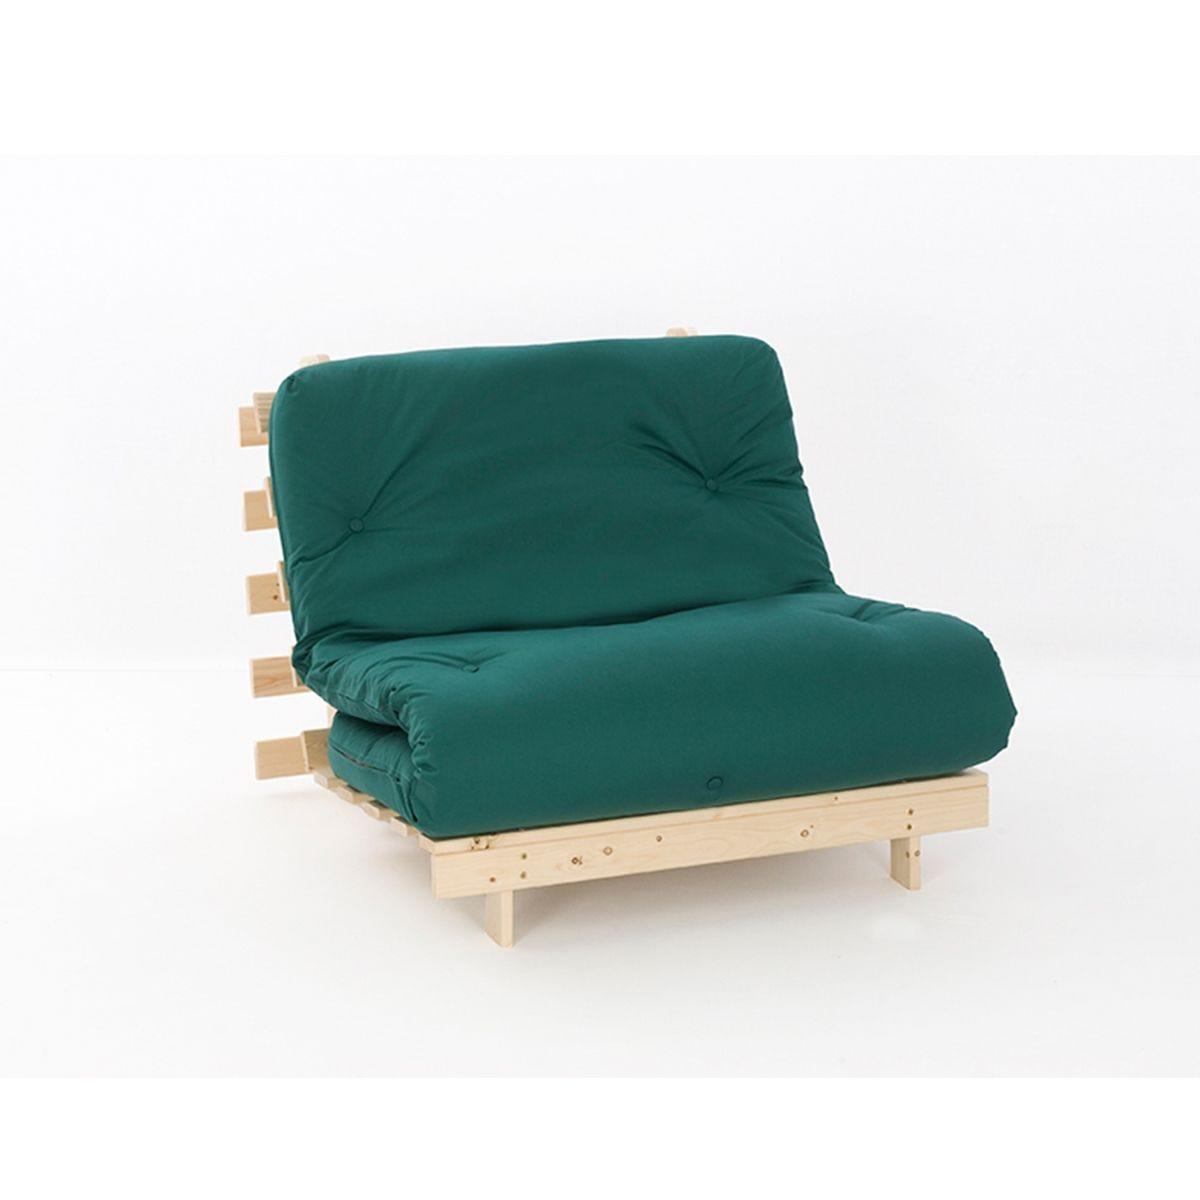 Ayr Futon Single Set With Tufted Mattress - Green